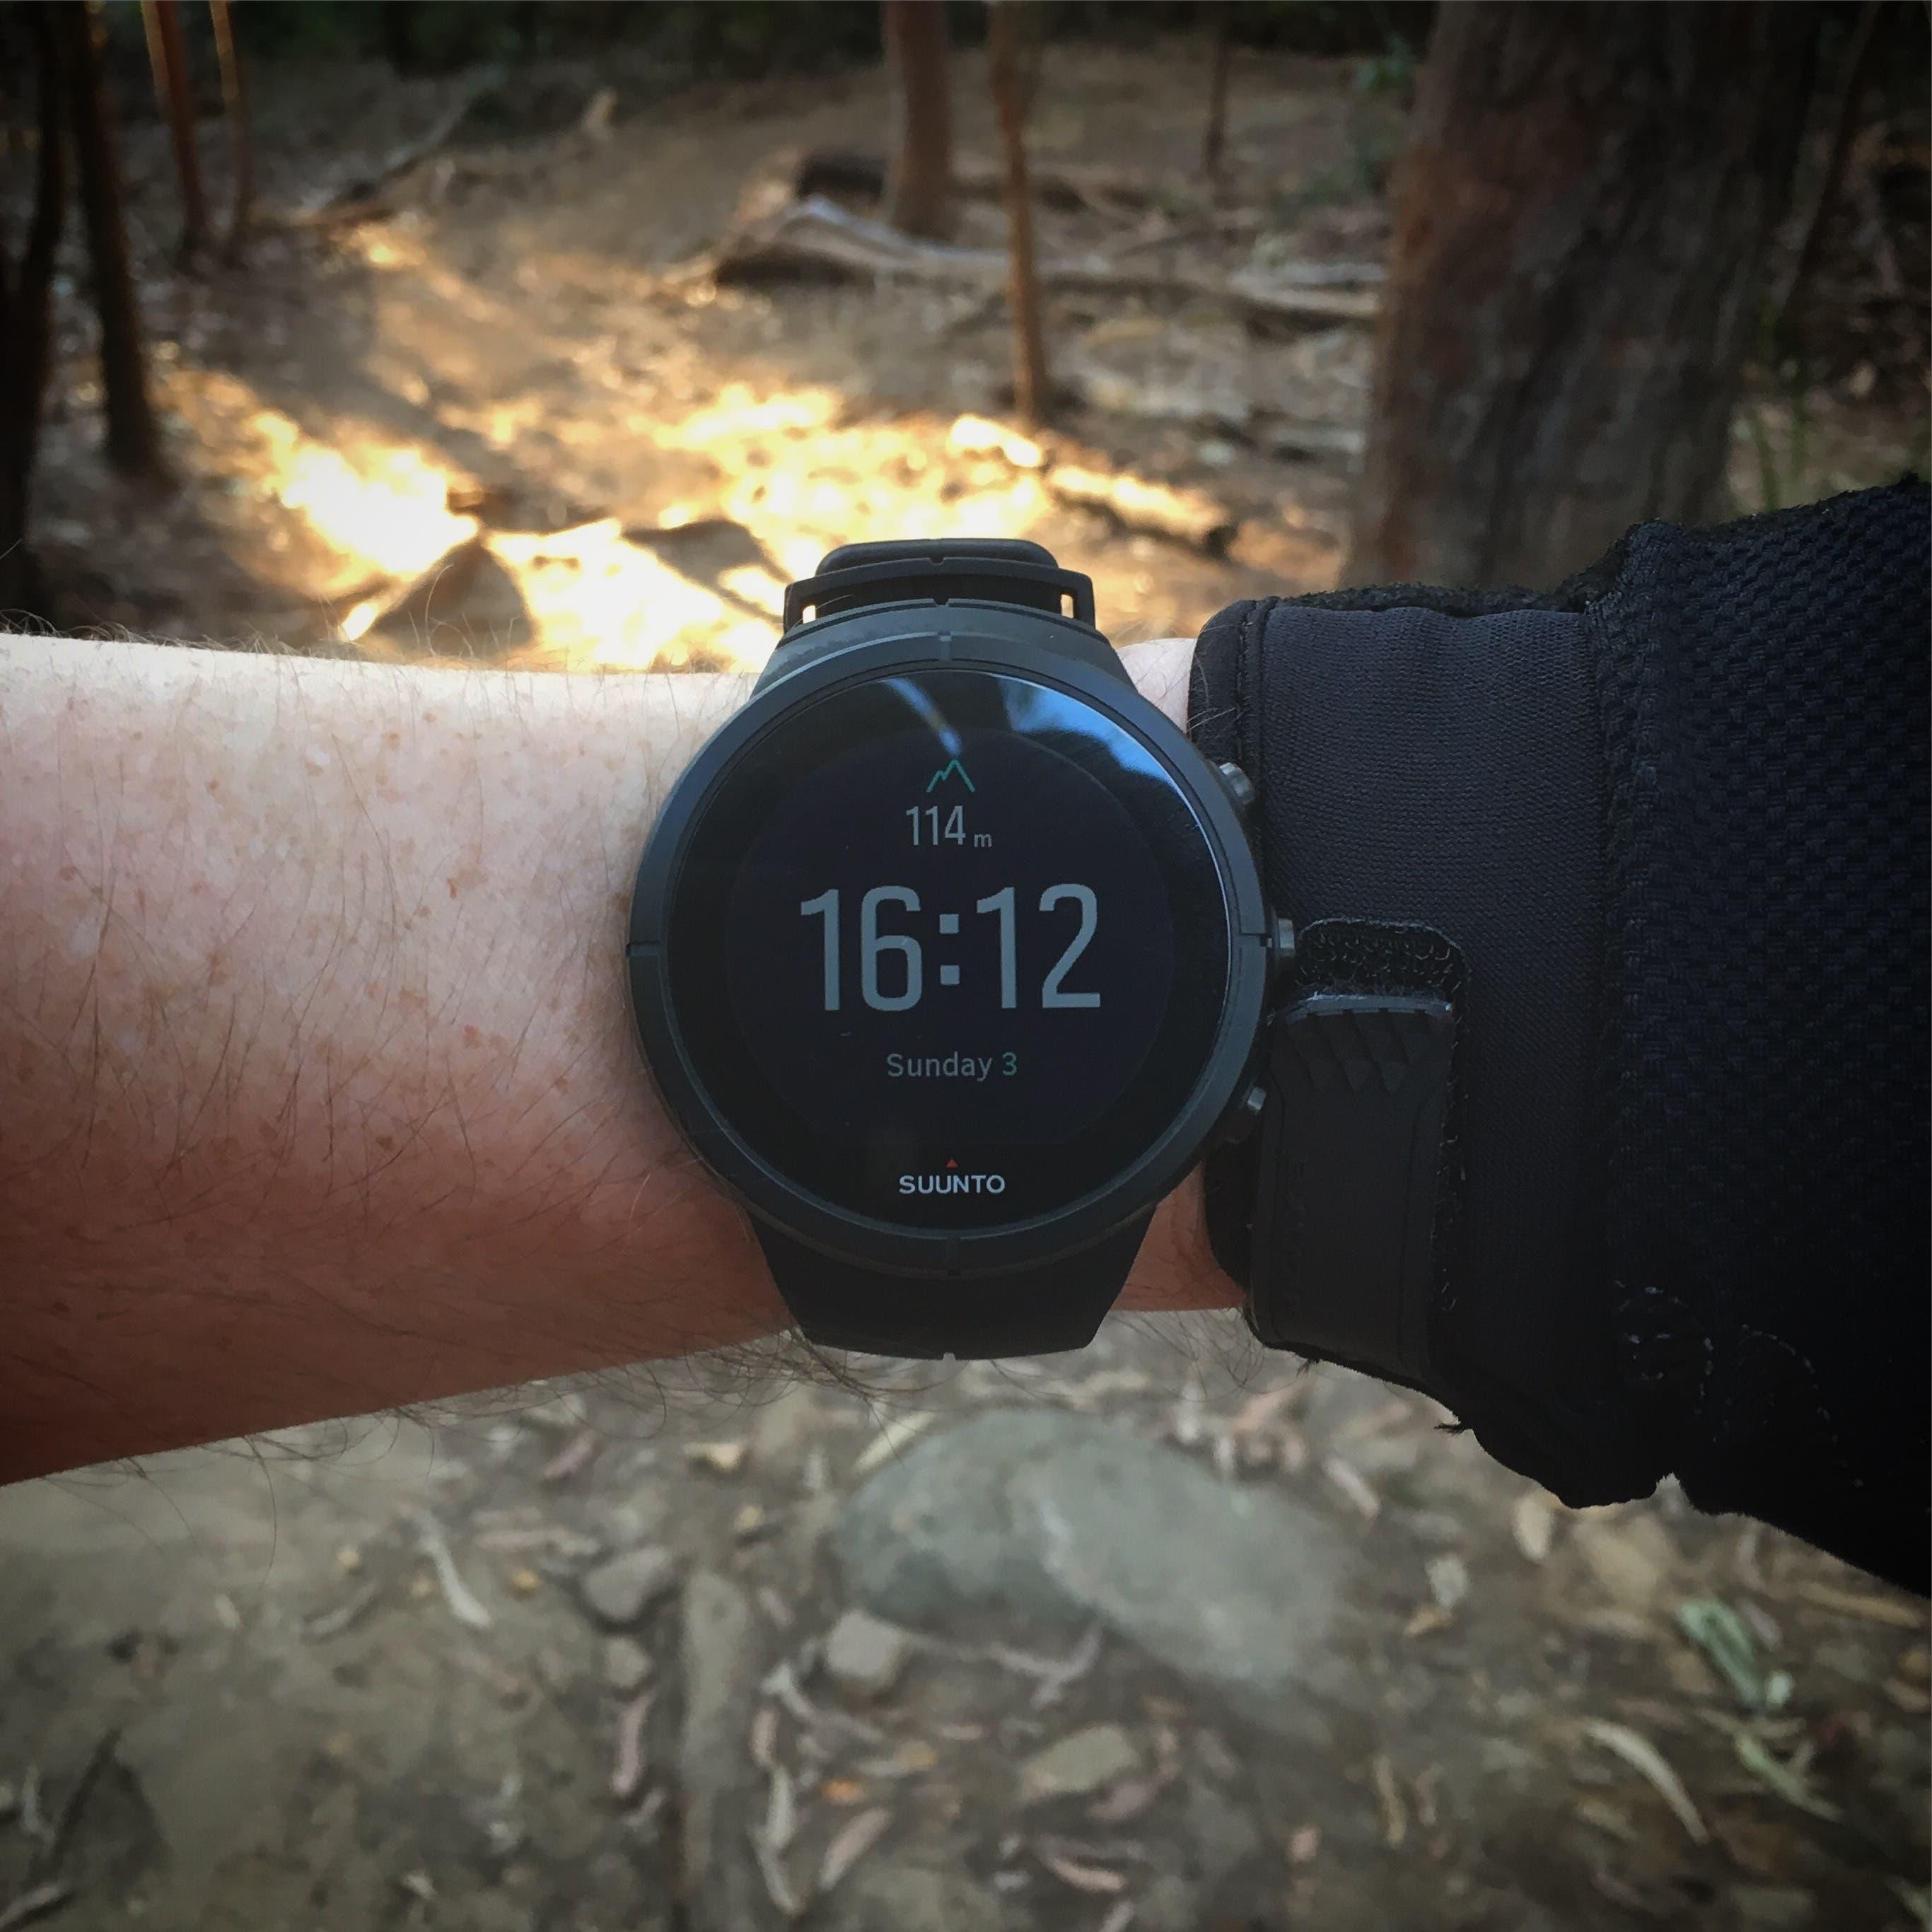 First Look Suunto Spartan Ultra Paddy Pallin Traverse Black Outdoor Watches With Gps Glonass